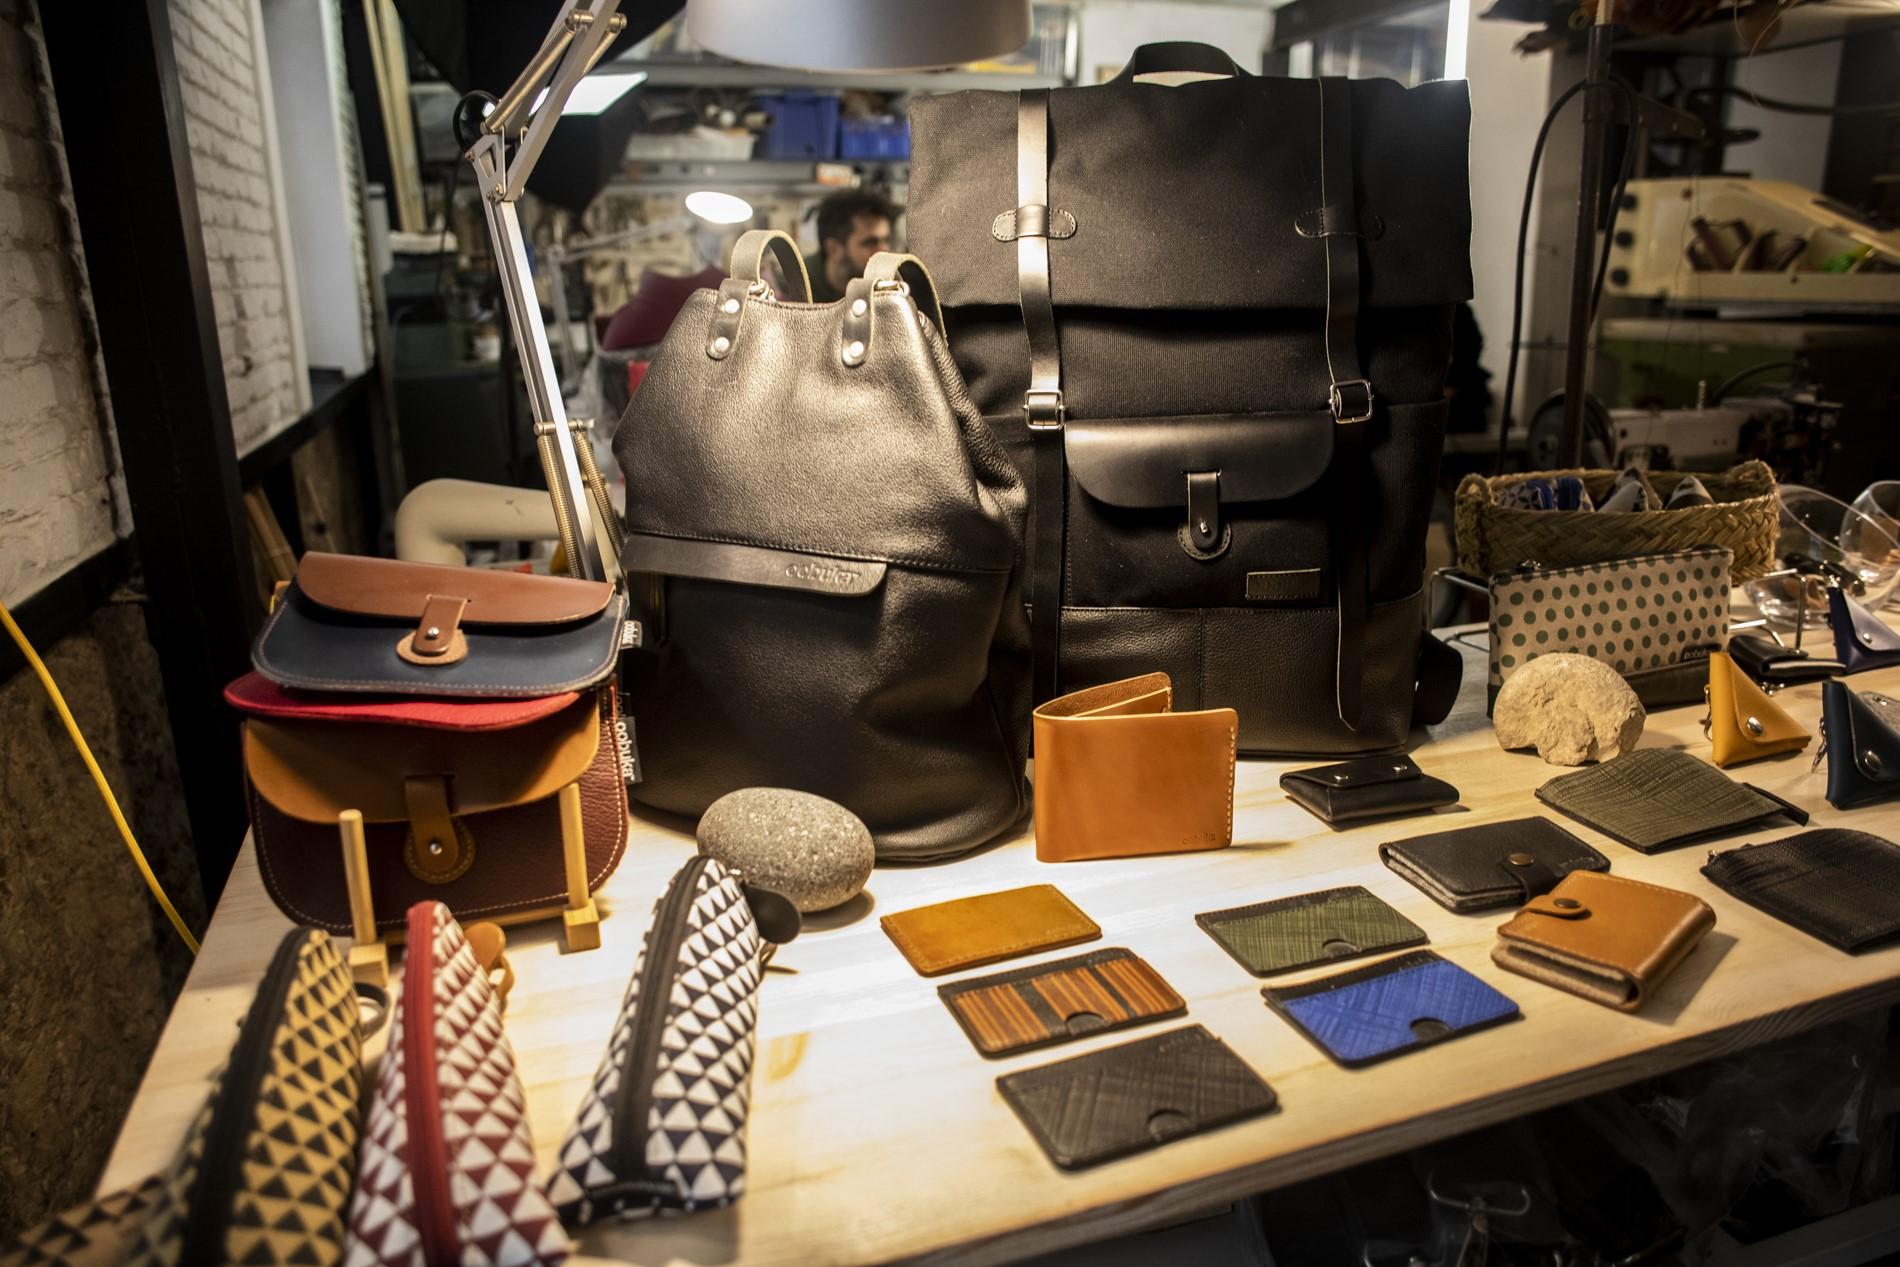 Bolsos, carteras, estuche para lápices... todo con un diseño vanguardista hecho a mano.